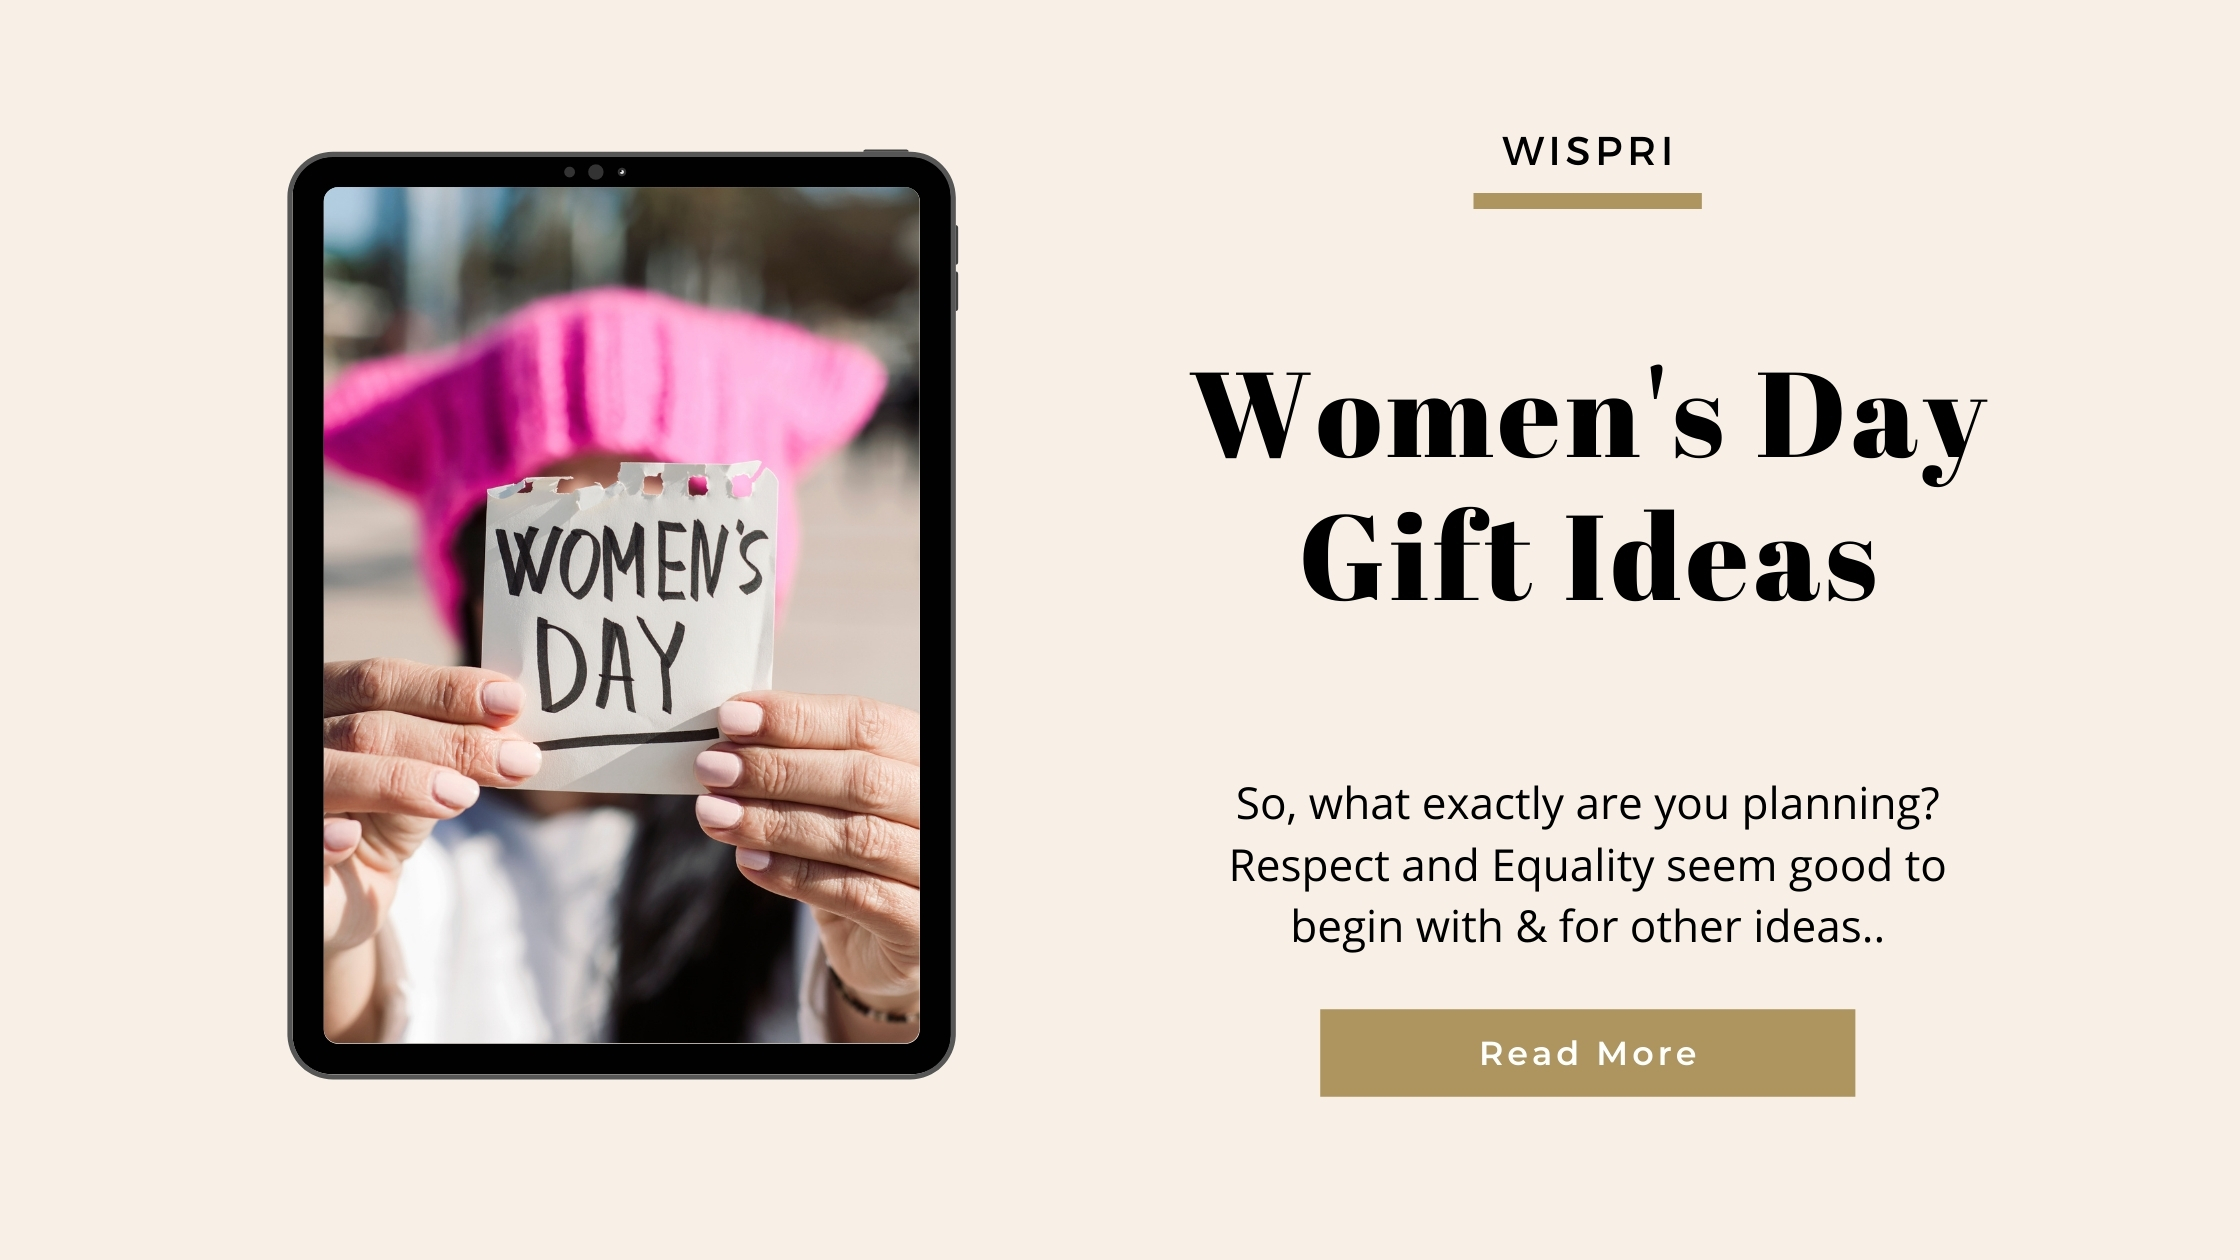 \Women's Day Gift Ideas 2021